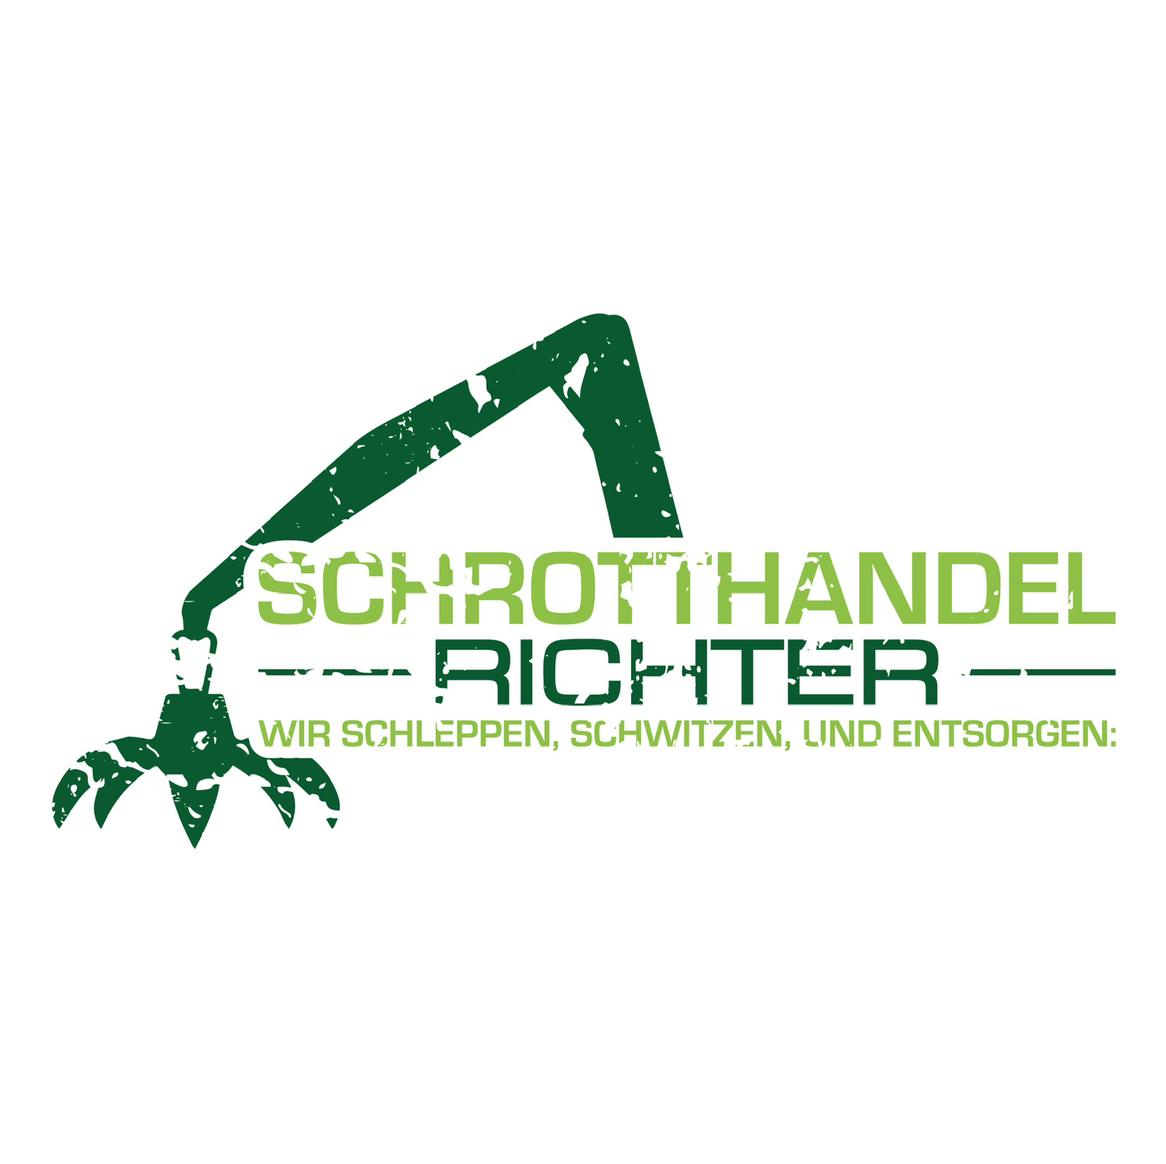 Schrotthandel Richter logo